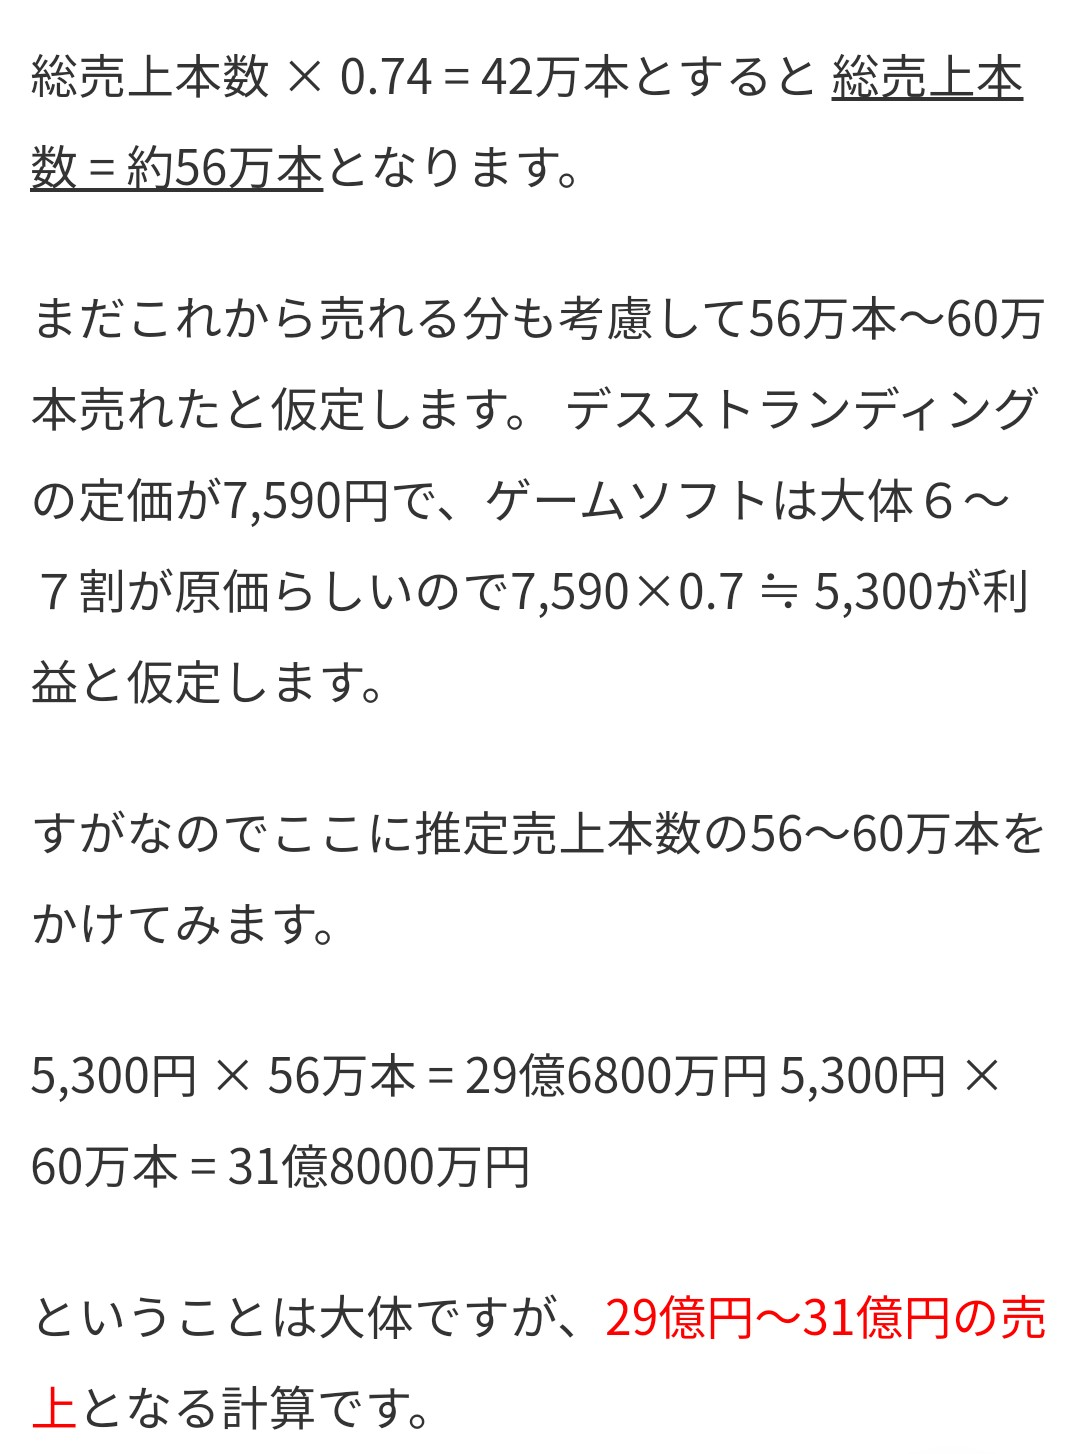 tcmDYR8 - 小島監督「デスストの売上は黒字。次の企画を準備できるだけの利益が確保出来た」